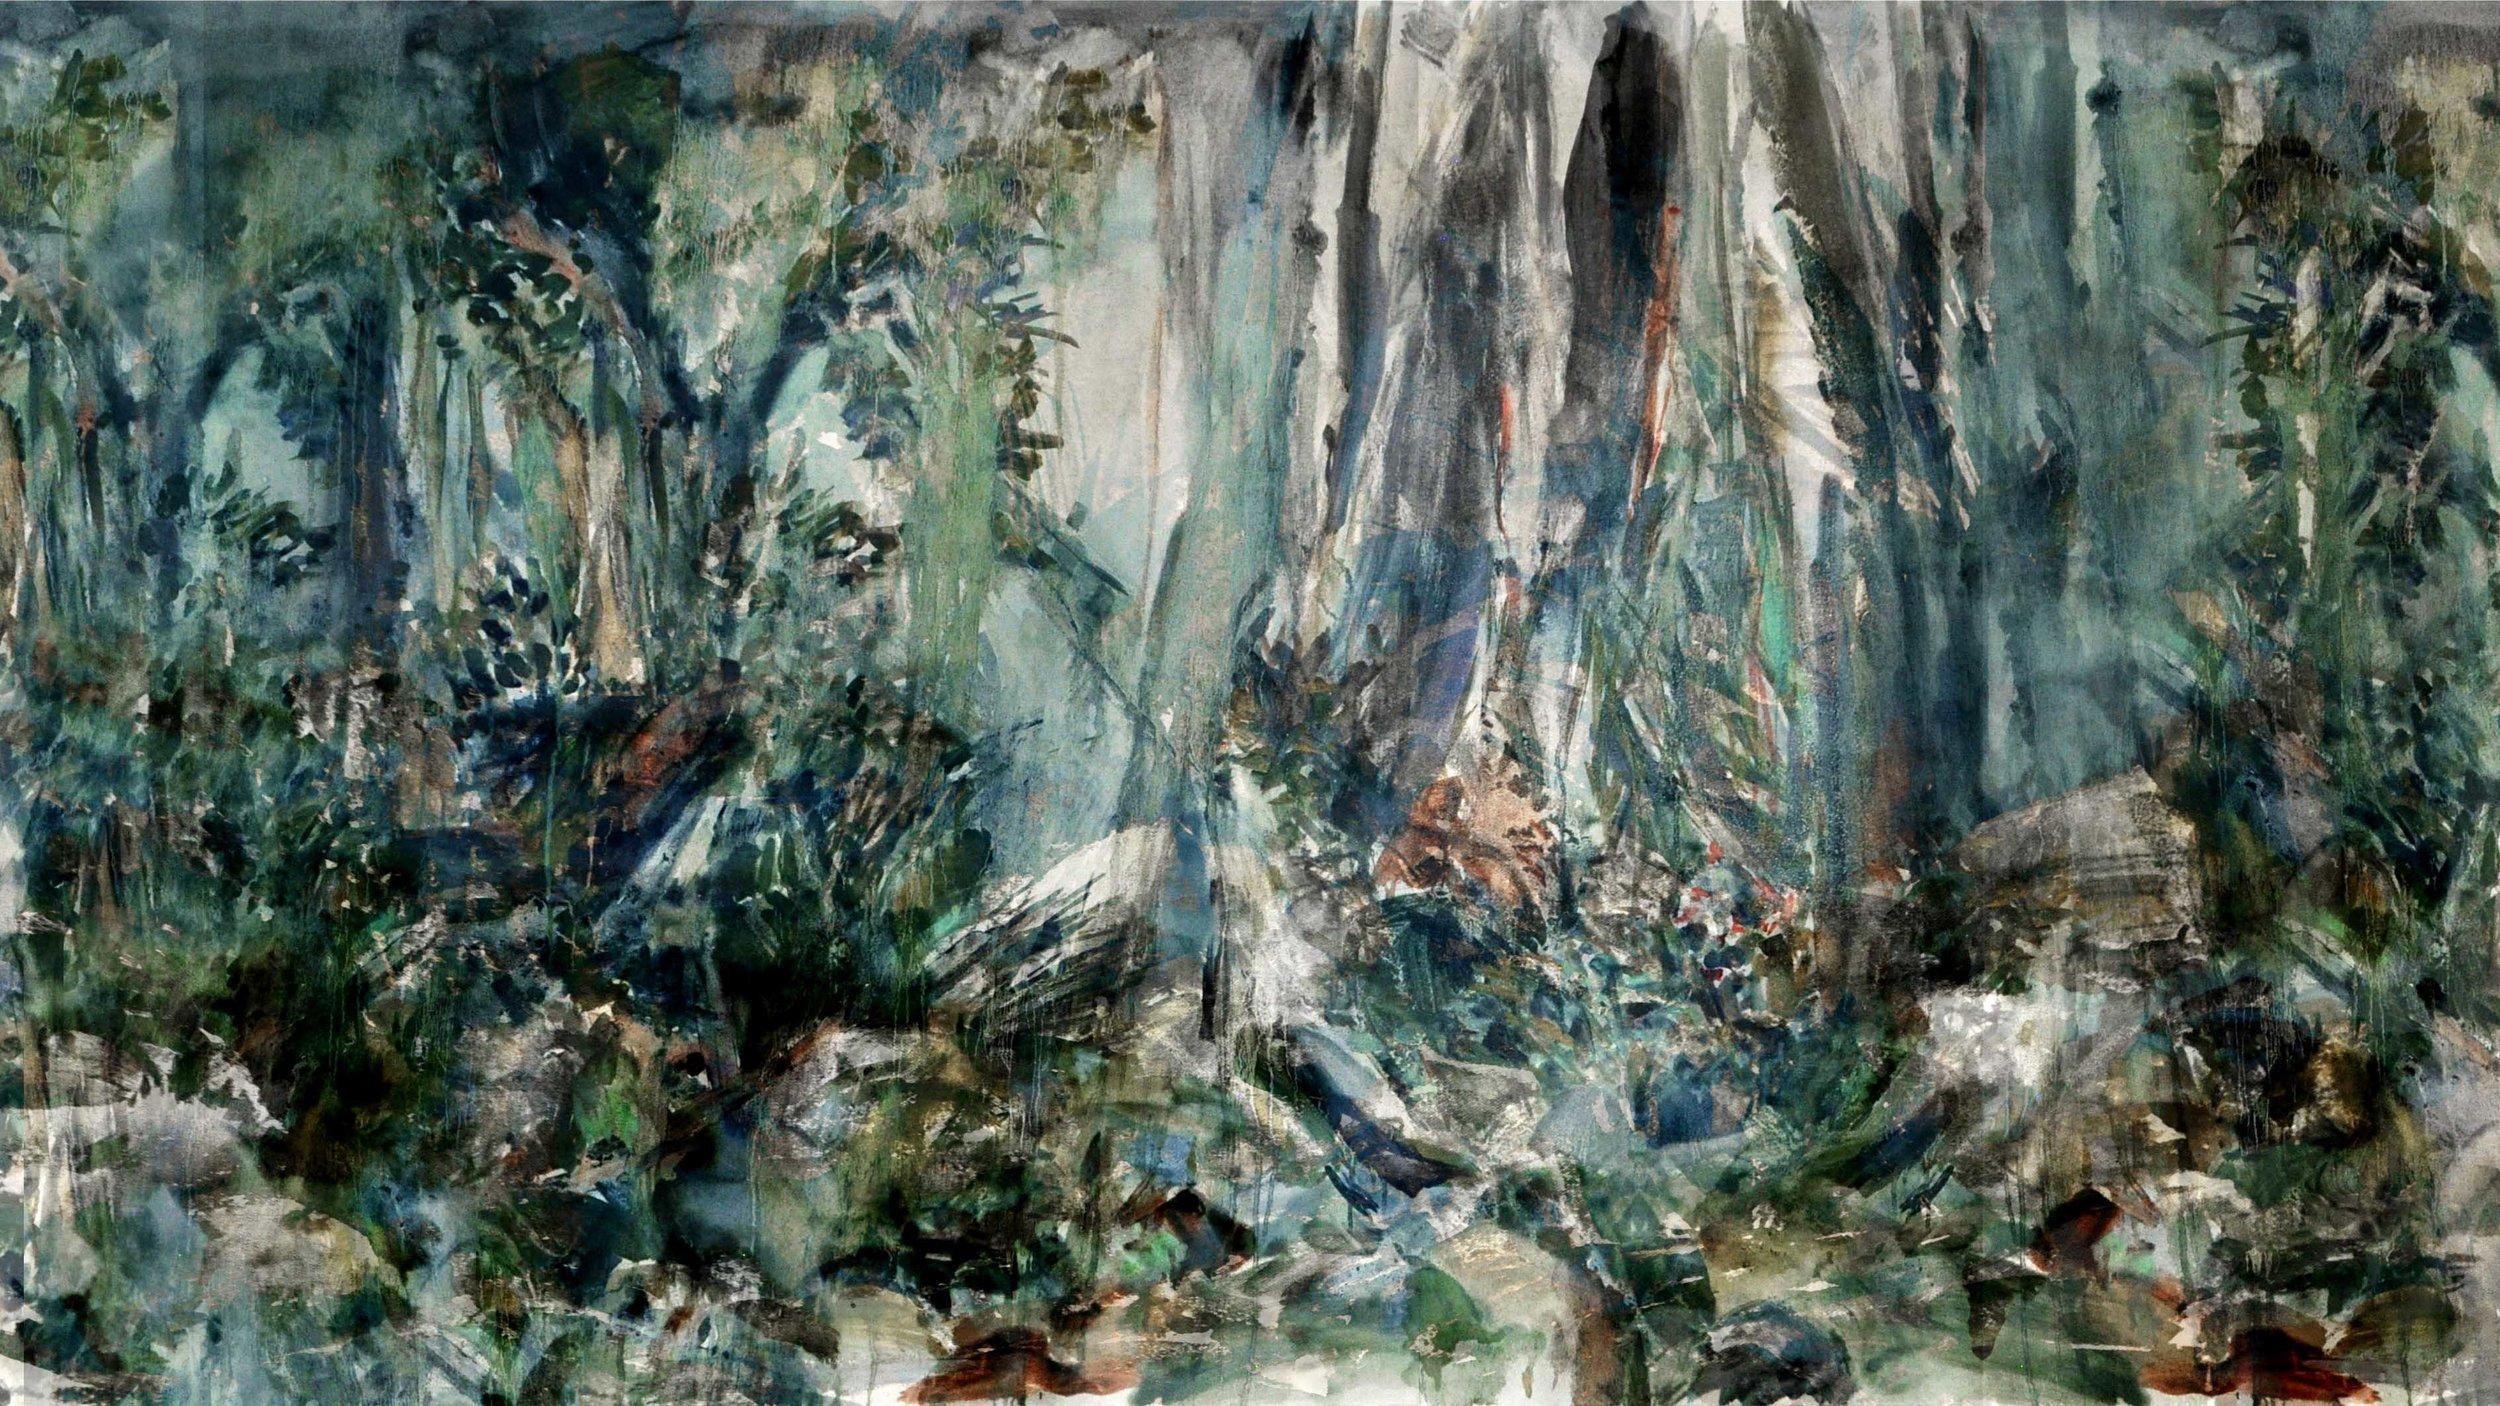 Marais 3, digital painting, dimensions variable, 2016